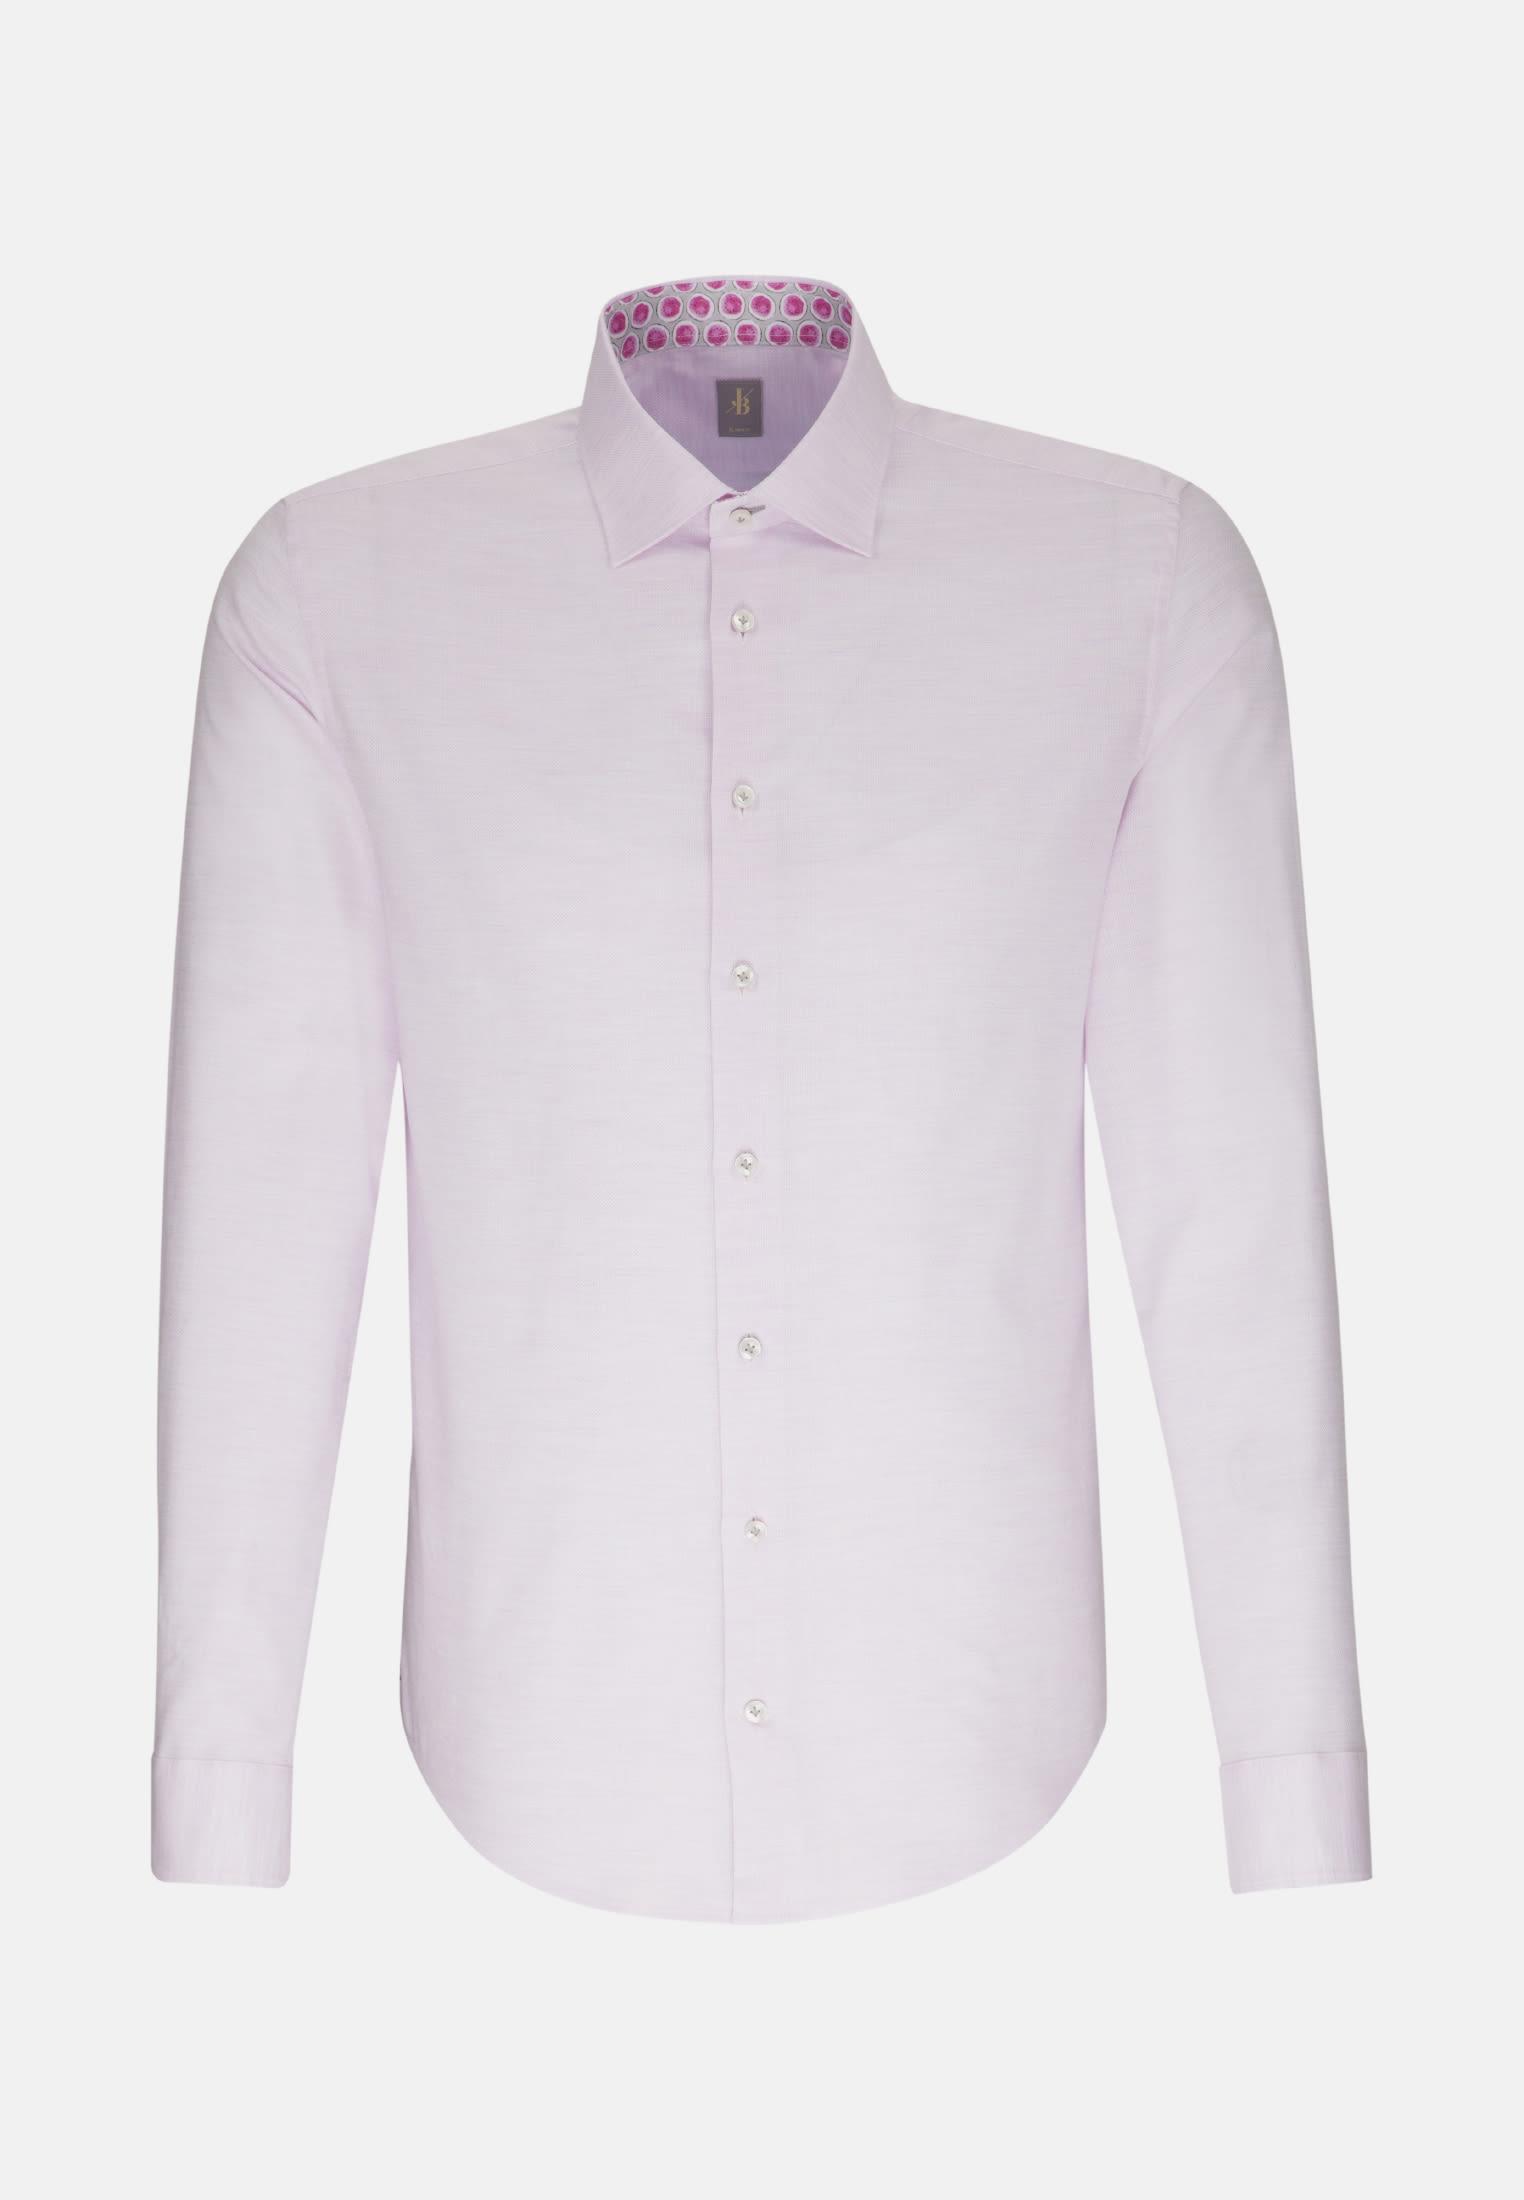 Struktur Smart Casual Hemd in Slim Fit mit Kentkragen in Rosa/Pink |  Jacques Britt Onlineshop